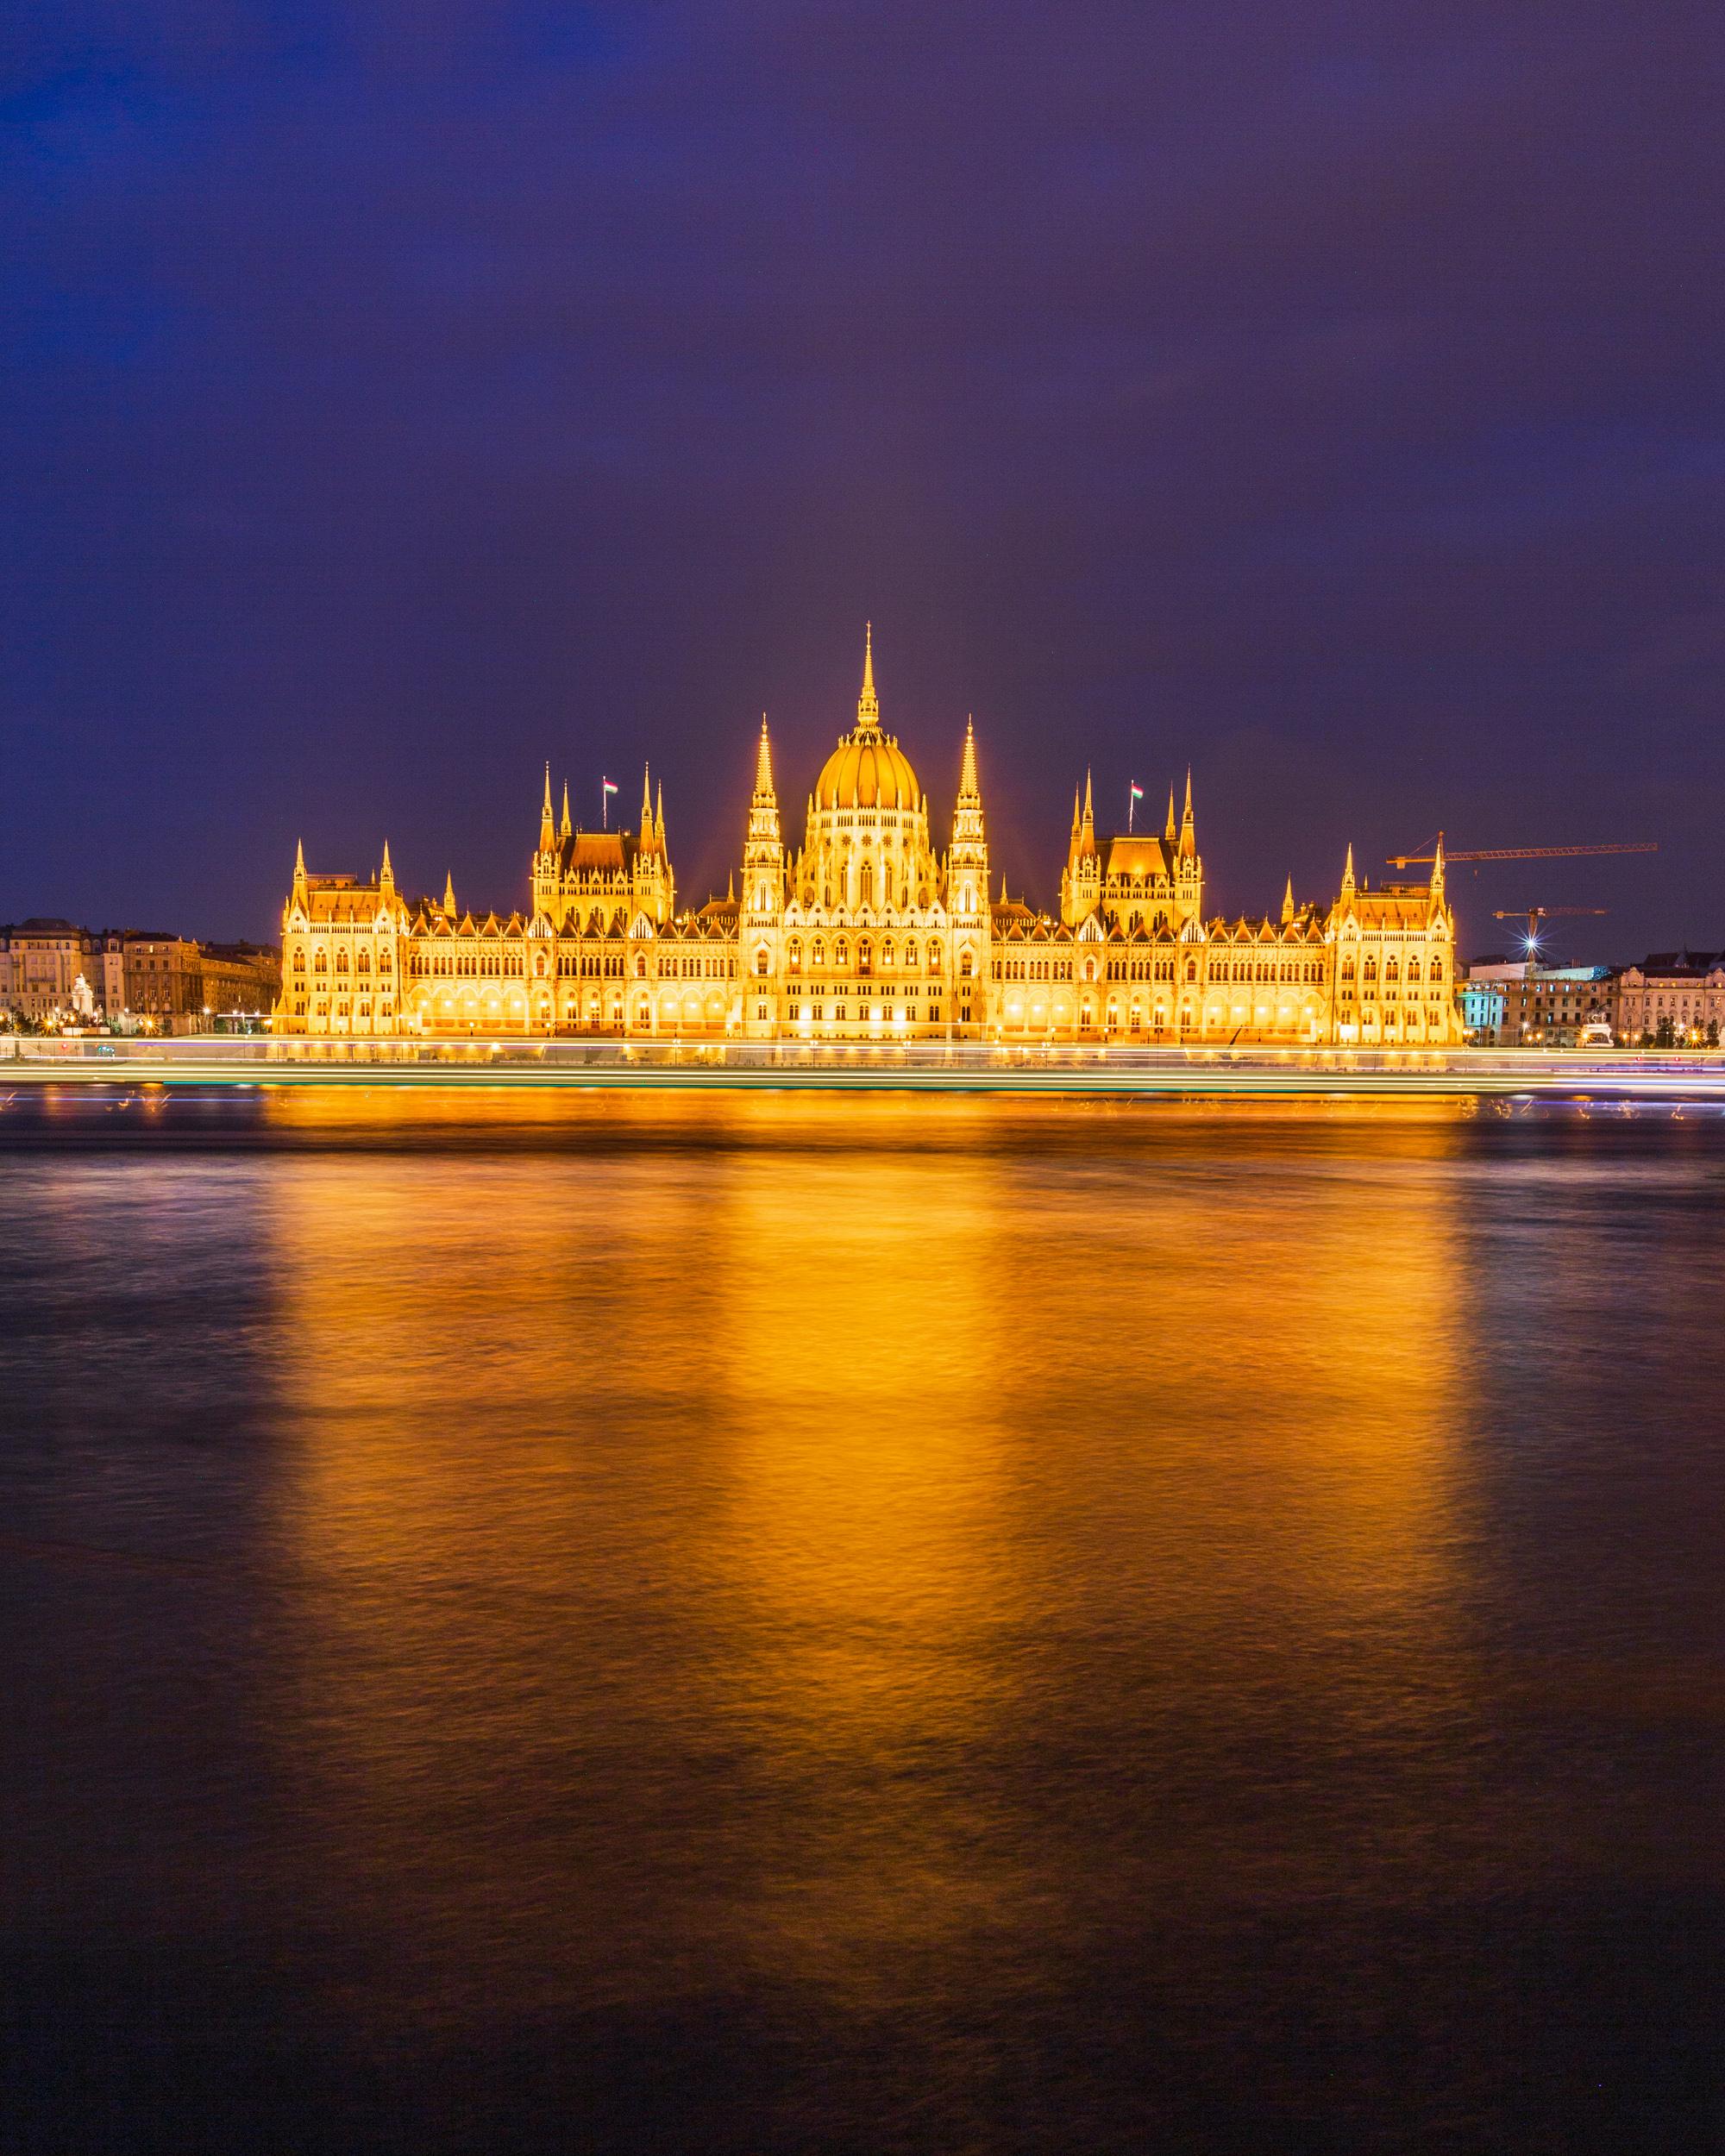 Hungarian Parliament Building seen across Danube River, ISO100, 26mm, f/16, 25sec